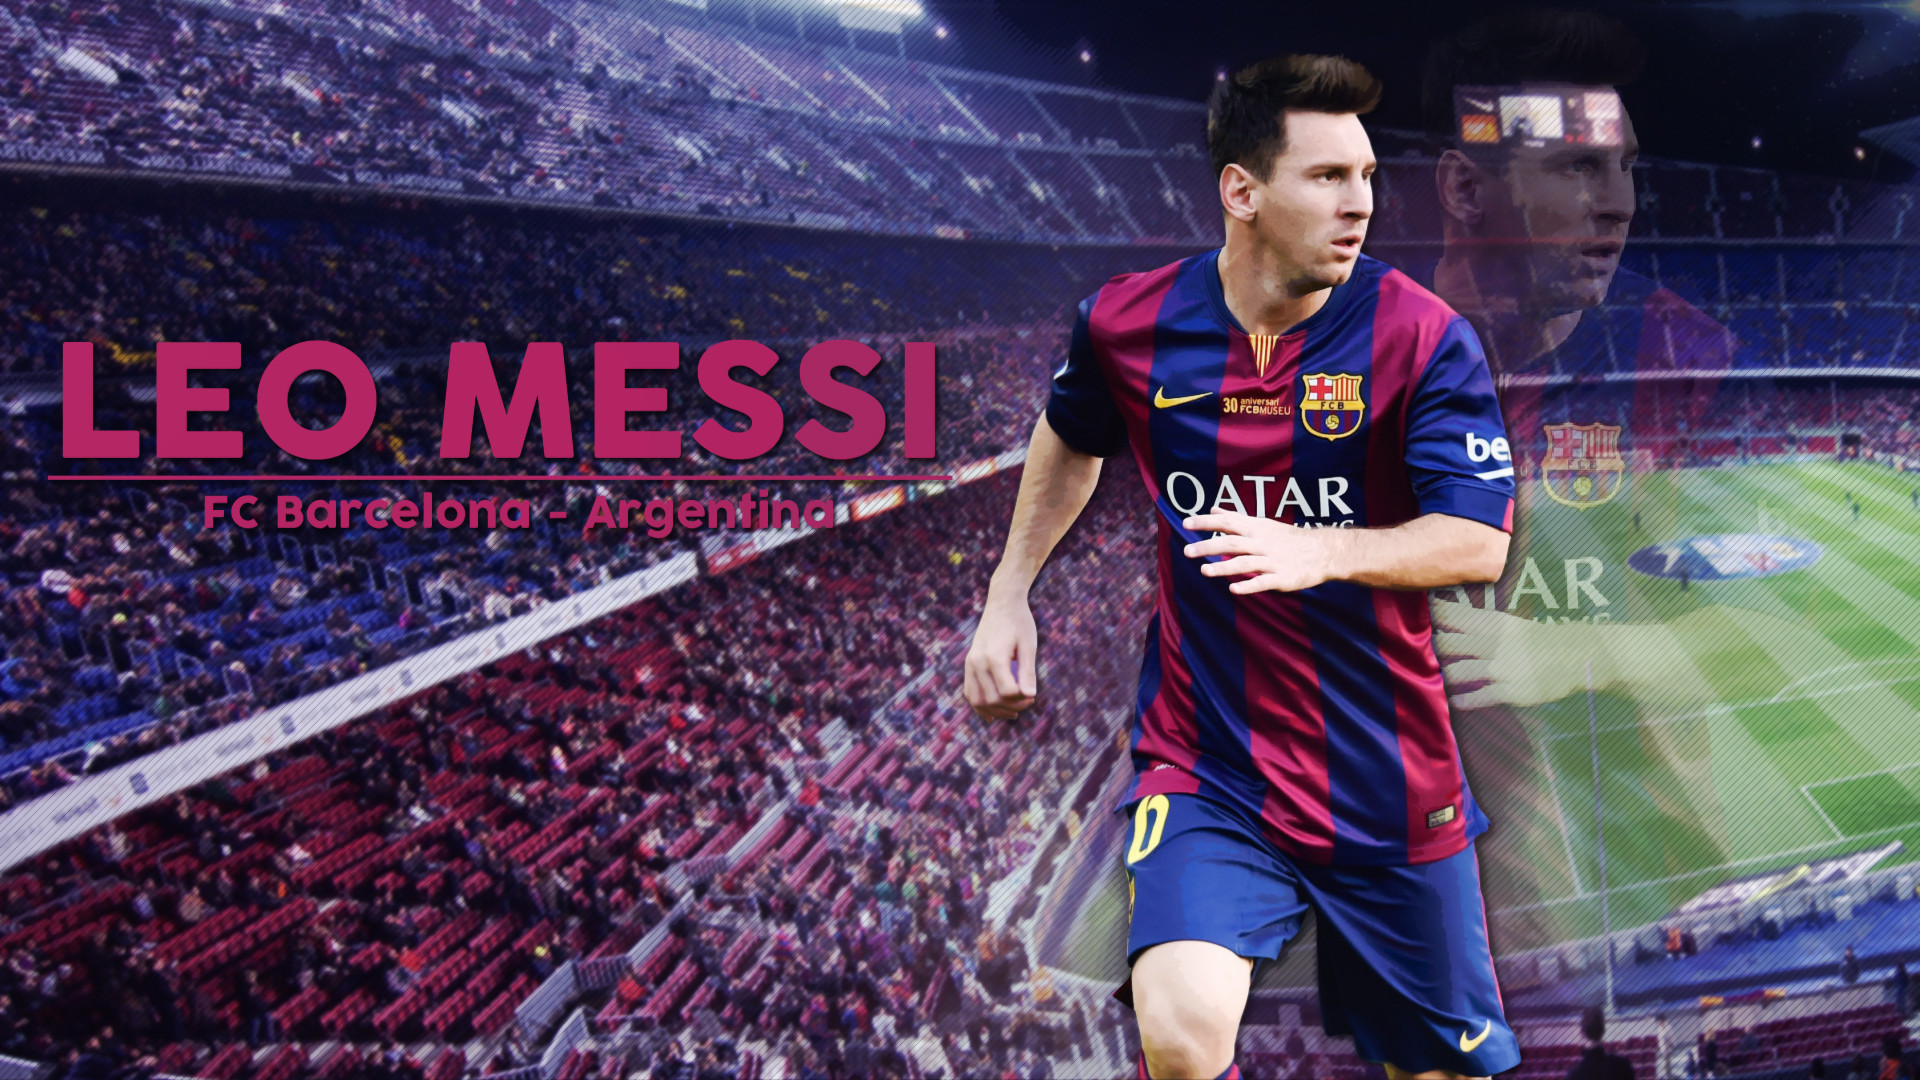 Messi Wallpapers HD Leo Messi wallpaper Barcelona